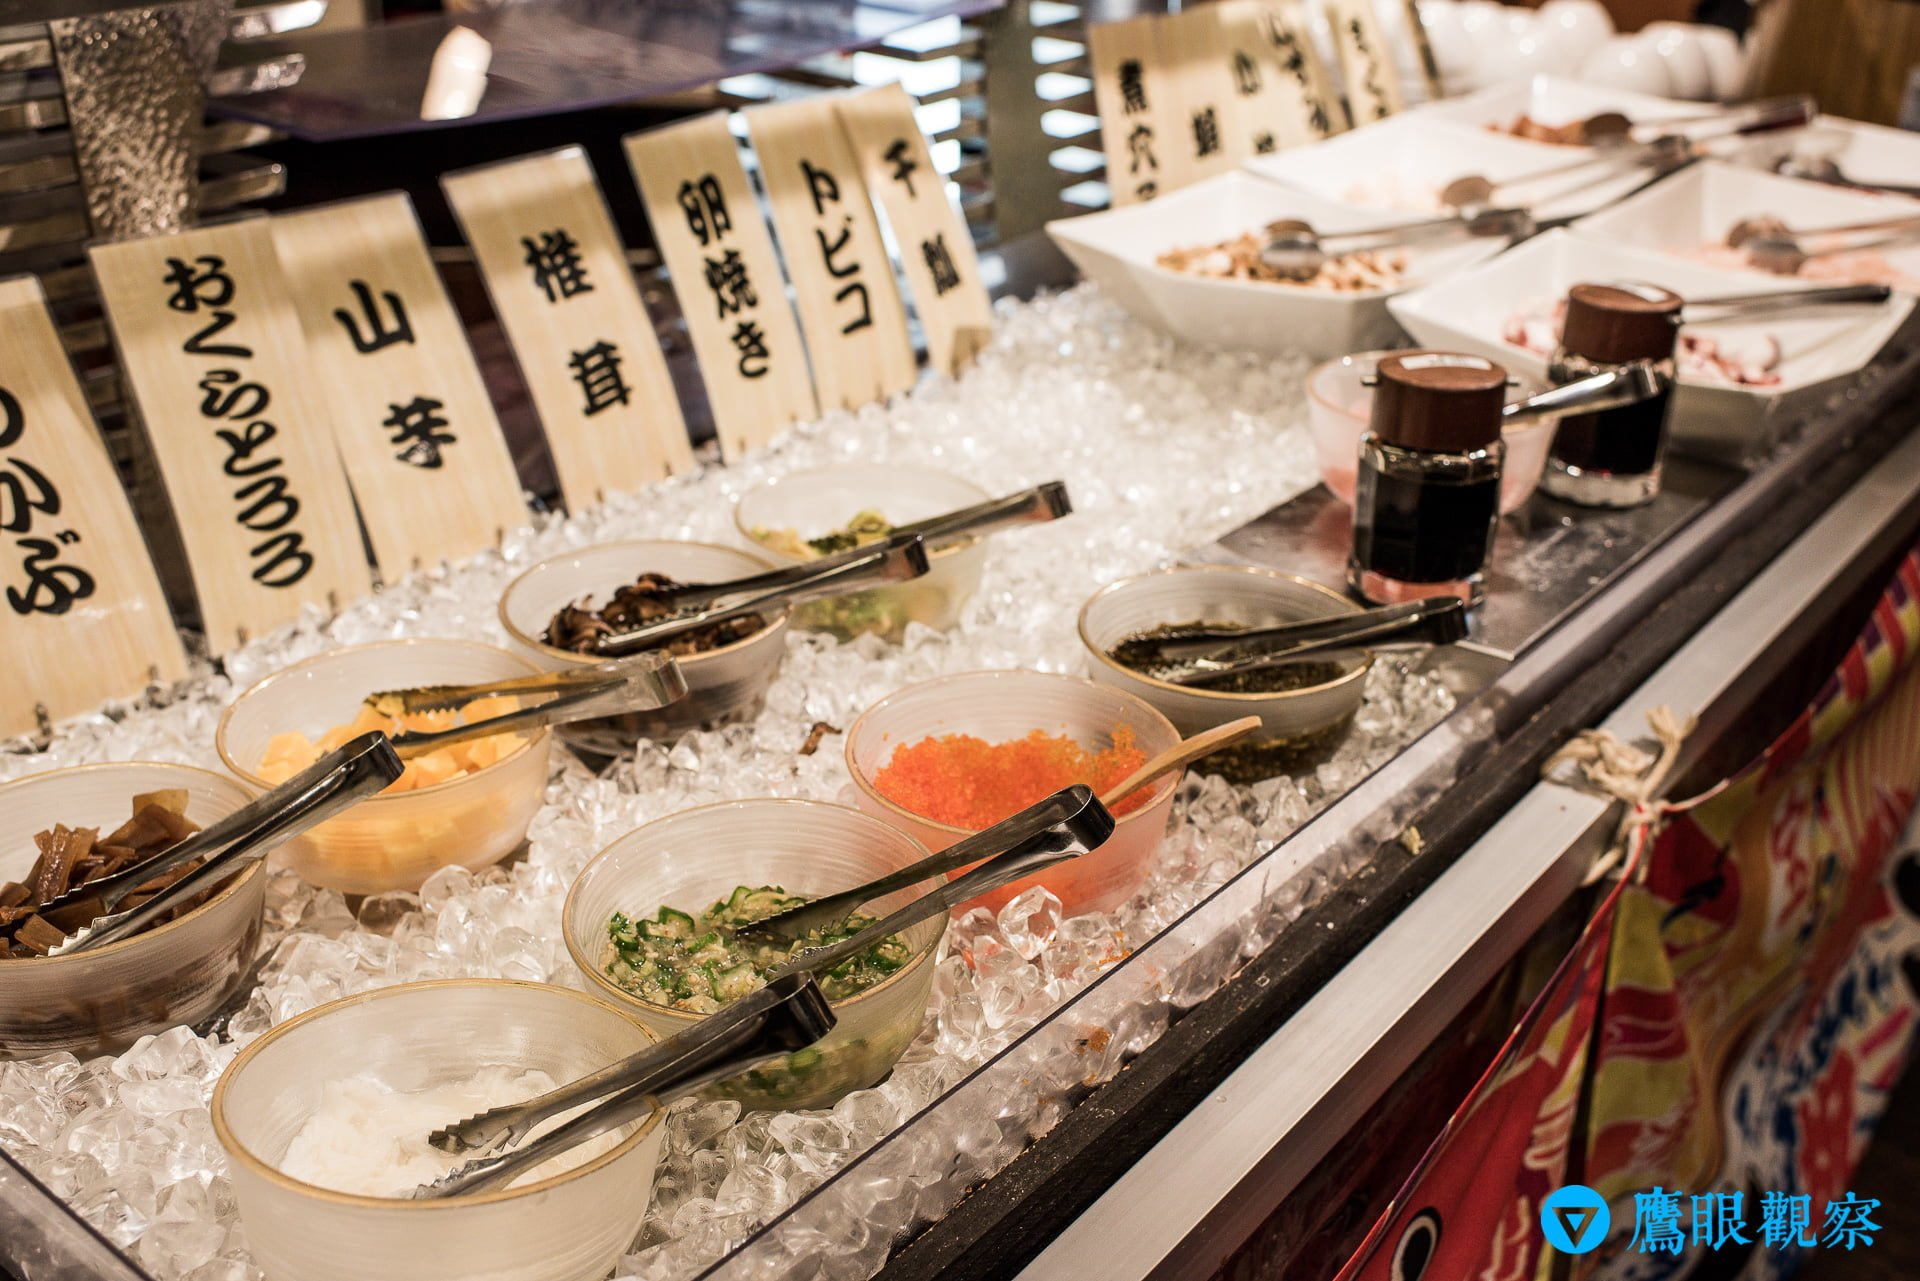 Travel Oarai Hotel in Ibaraki Prefecture Japan 32 日本茨城縣/東茨城/大洗飯店(大洗ホテル)/旅館推薦與住宿旅遊心得分享